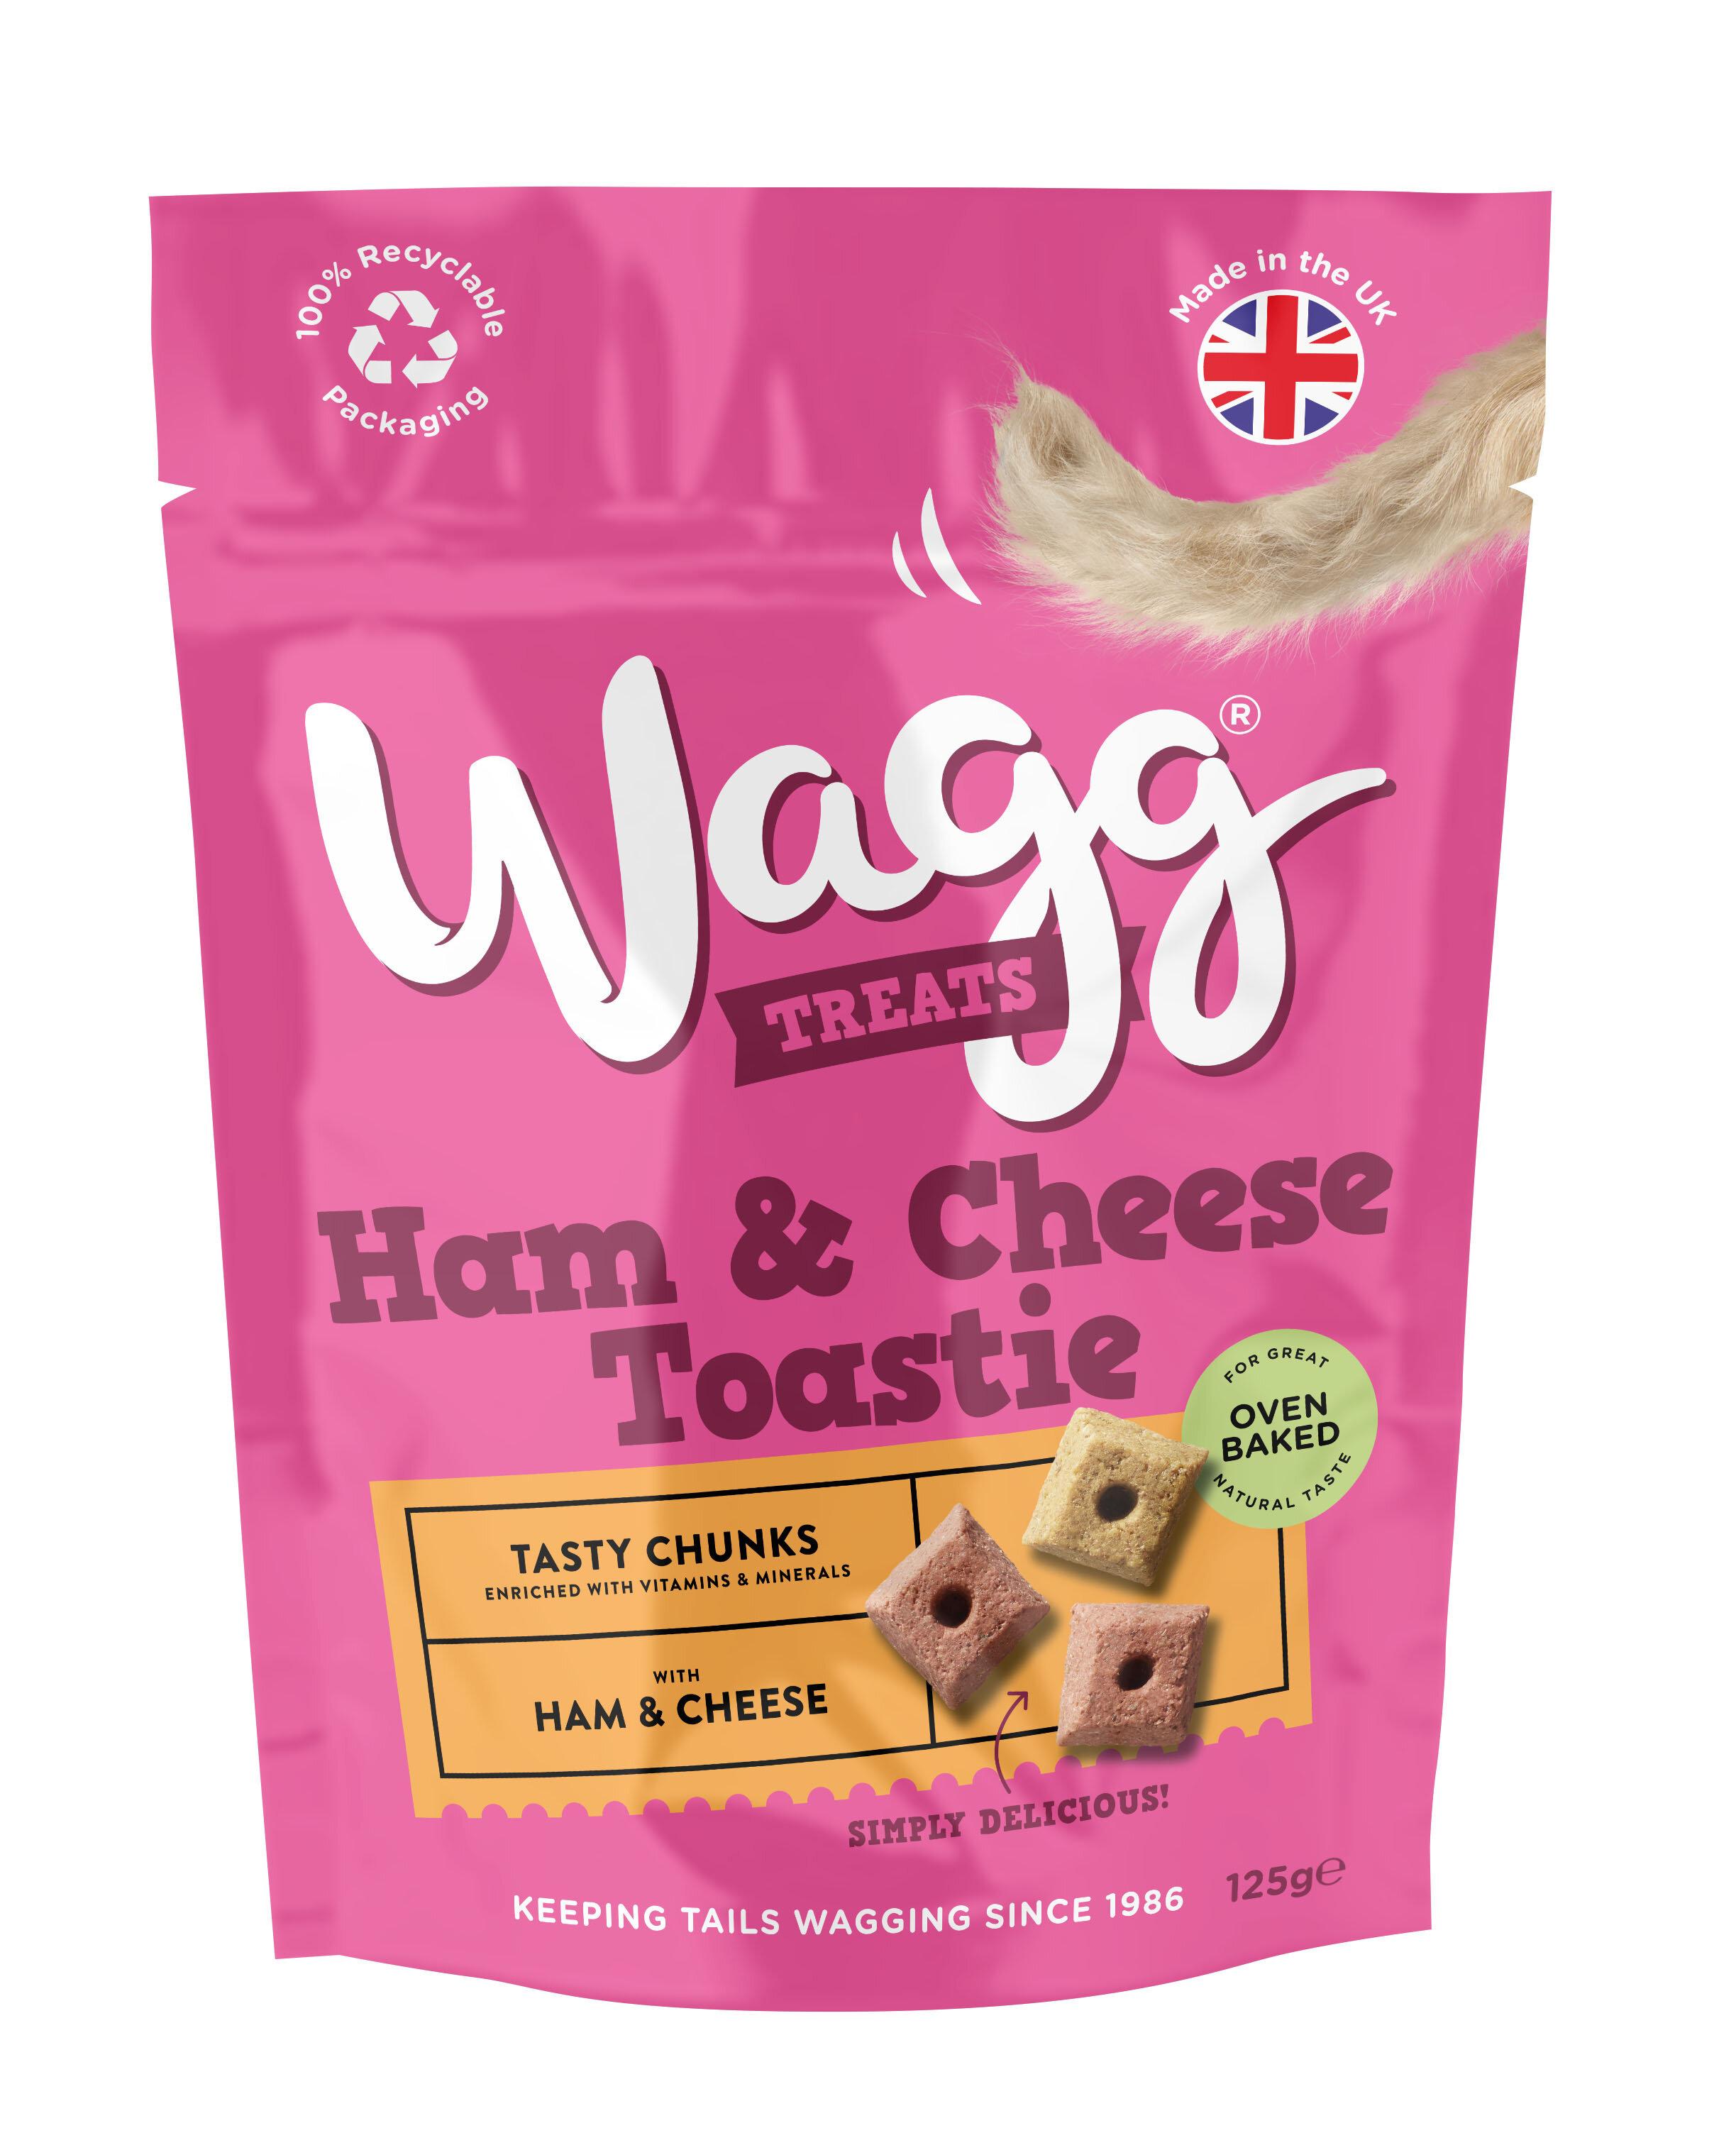 Wagg Dog Treats Ham & Cheese Toastie 125g x 7